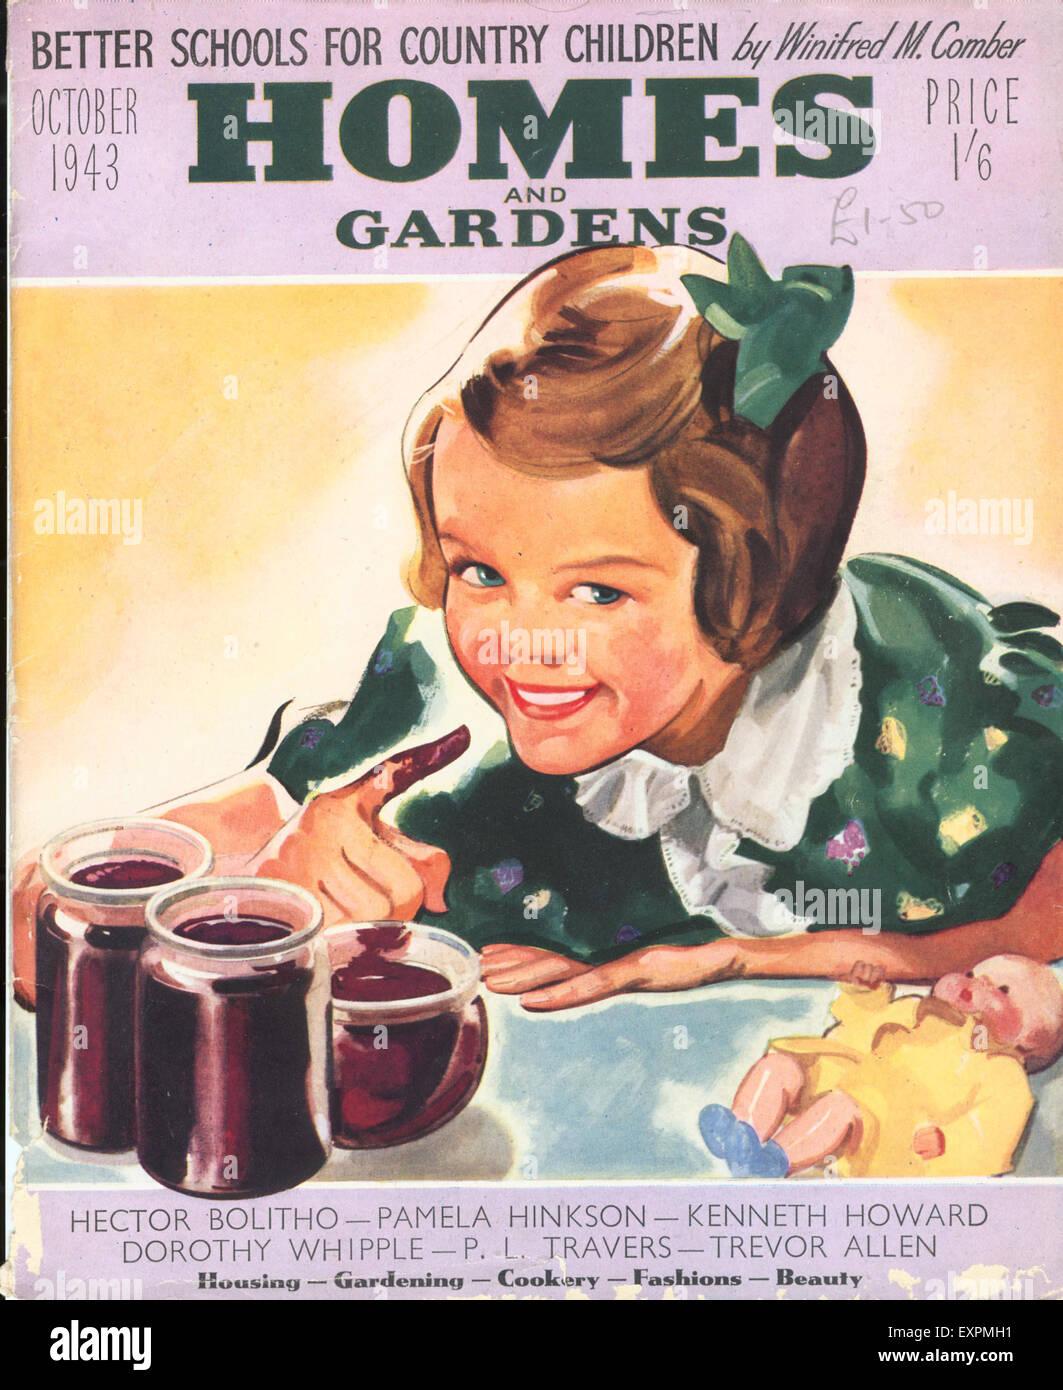 1940s Uk Homes And Gardens Magazine Cover Stock Photo 85321629